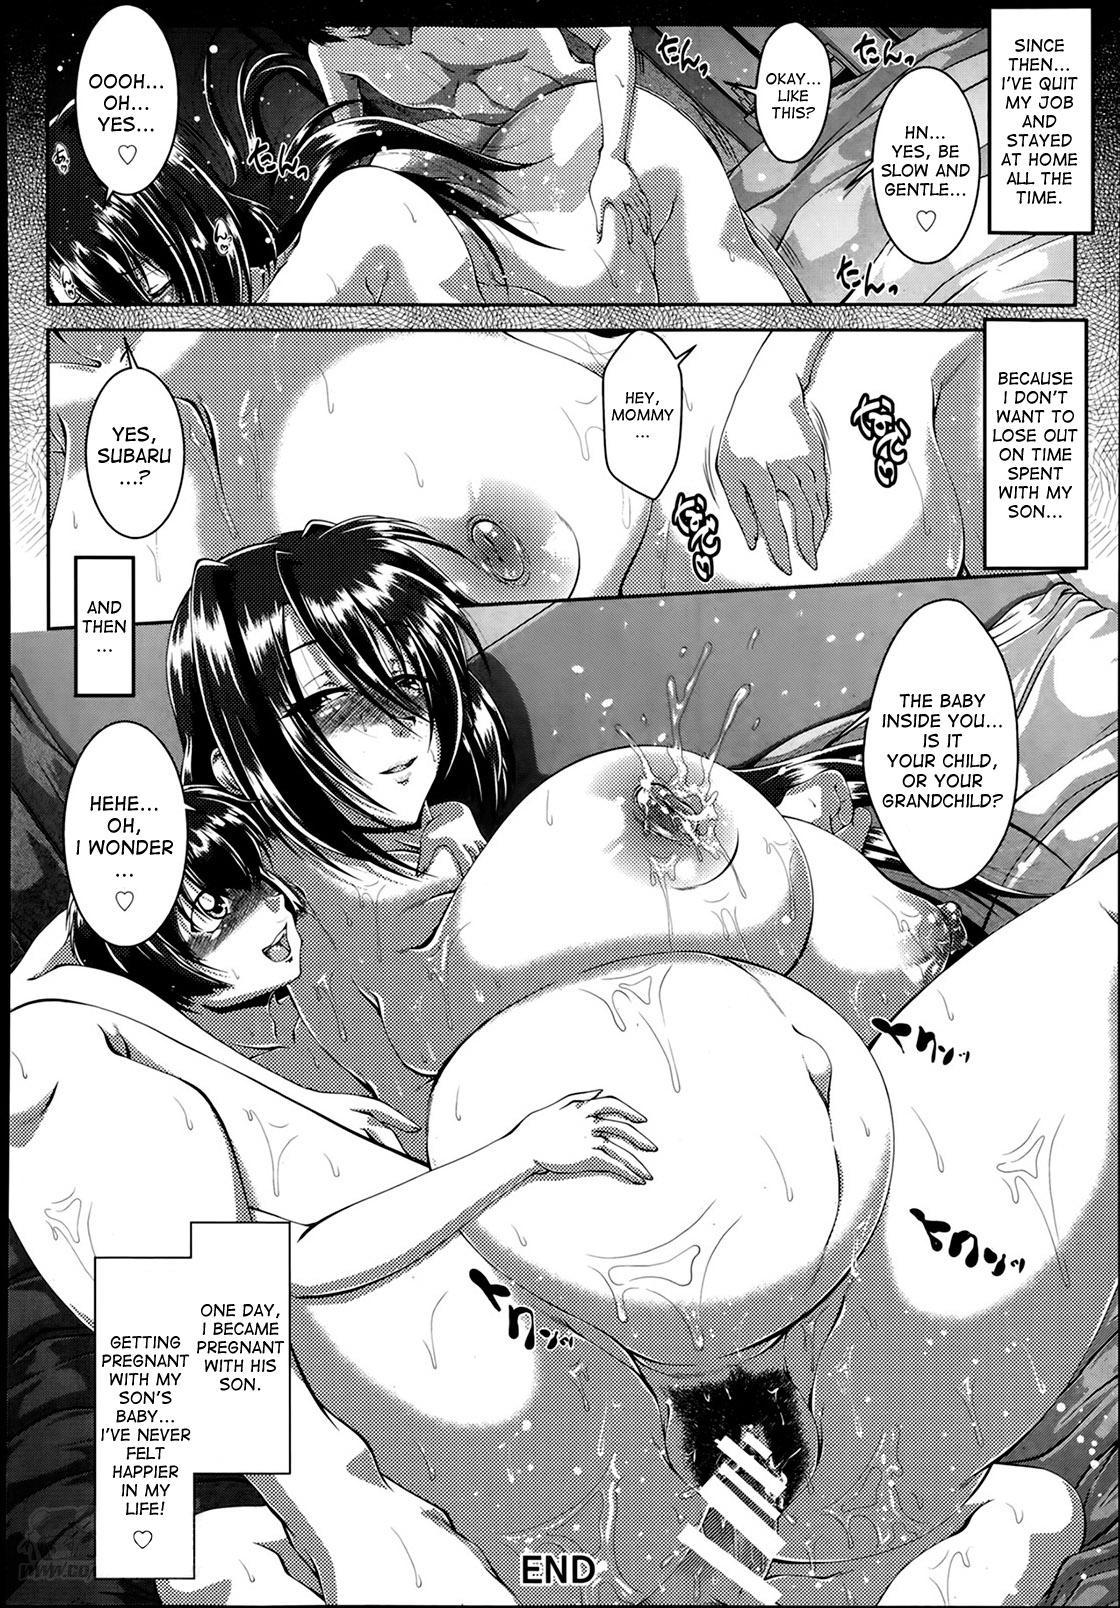 [Zero Tanuki] Musuko Kui ~Enbo no Inwaku~ | Son Feasting ~Lewd Mother Seduction~ (ANGEL Club 2014-05) [English] [desudesu] 19